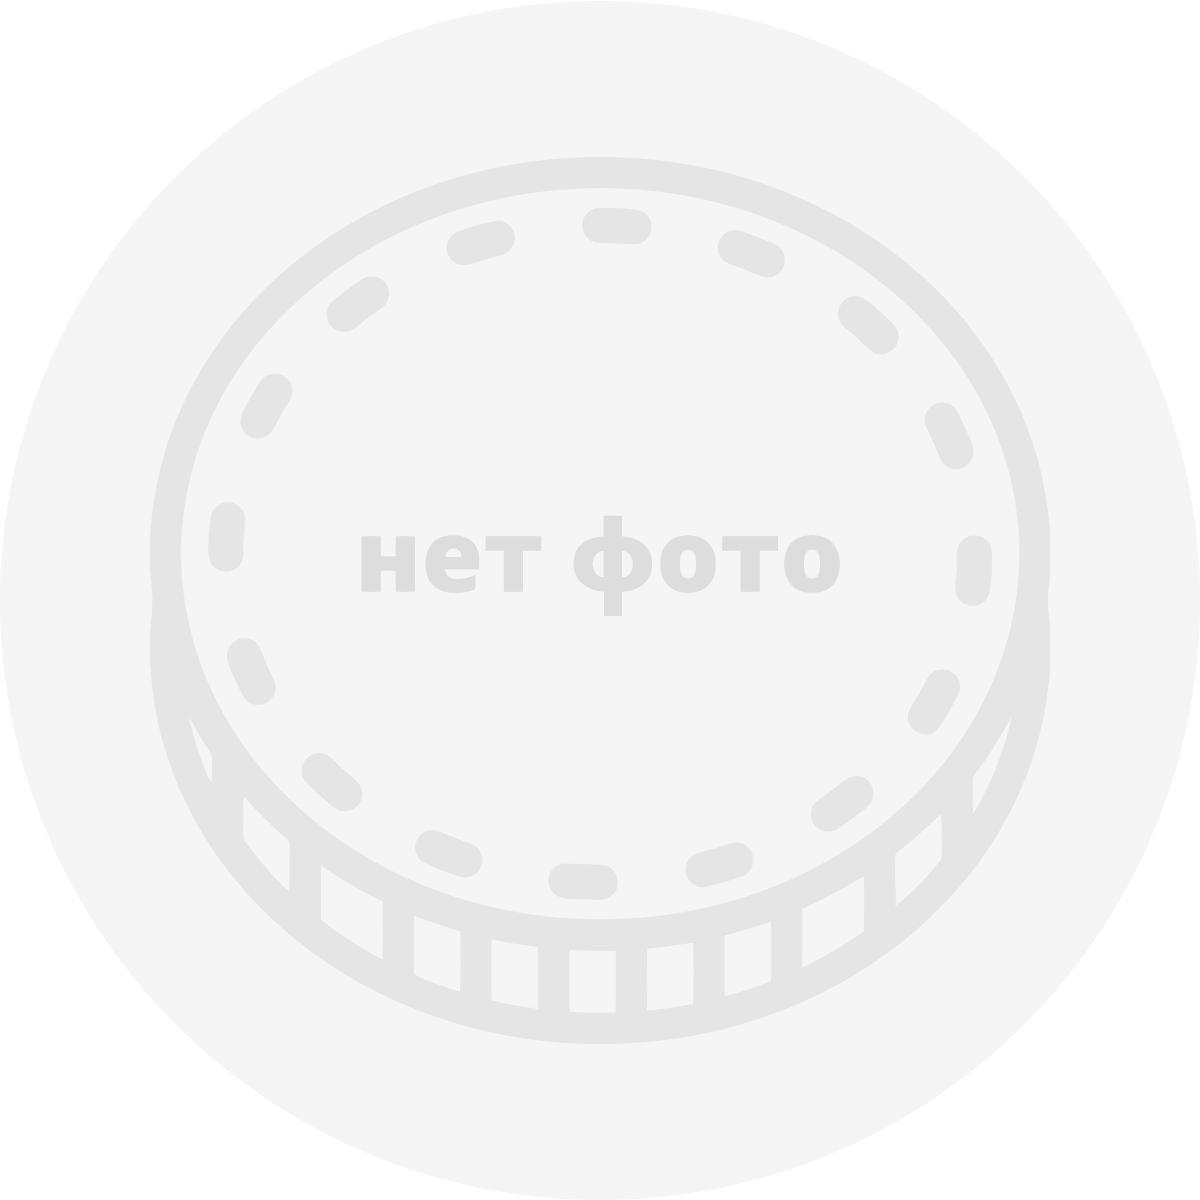 Антильские острова, 2 1/2 цента (1959 г.)